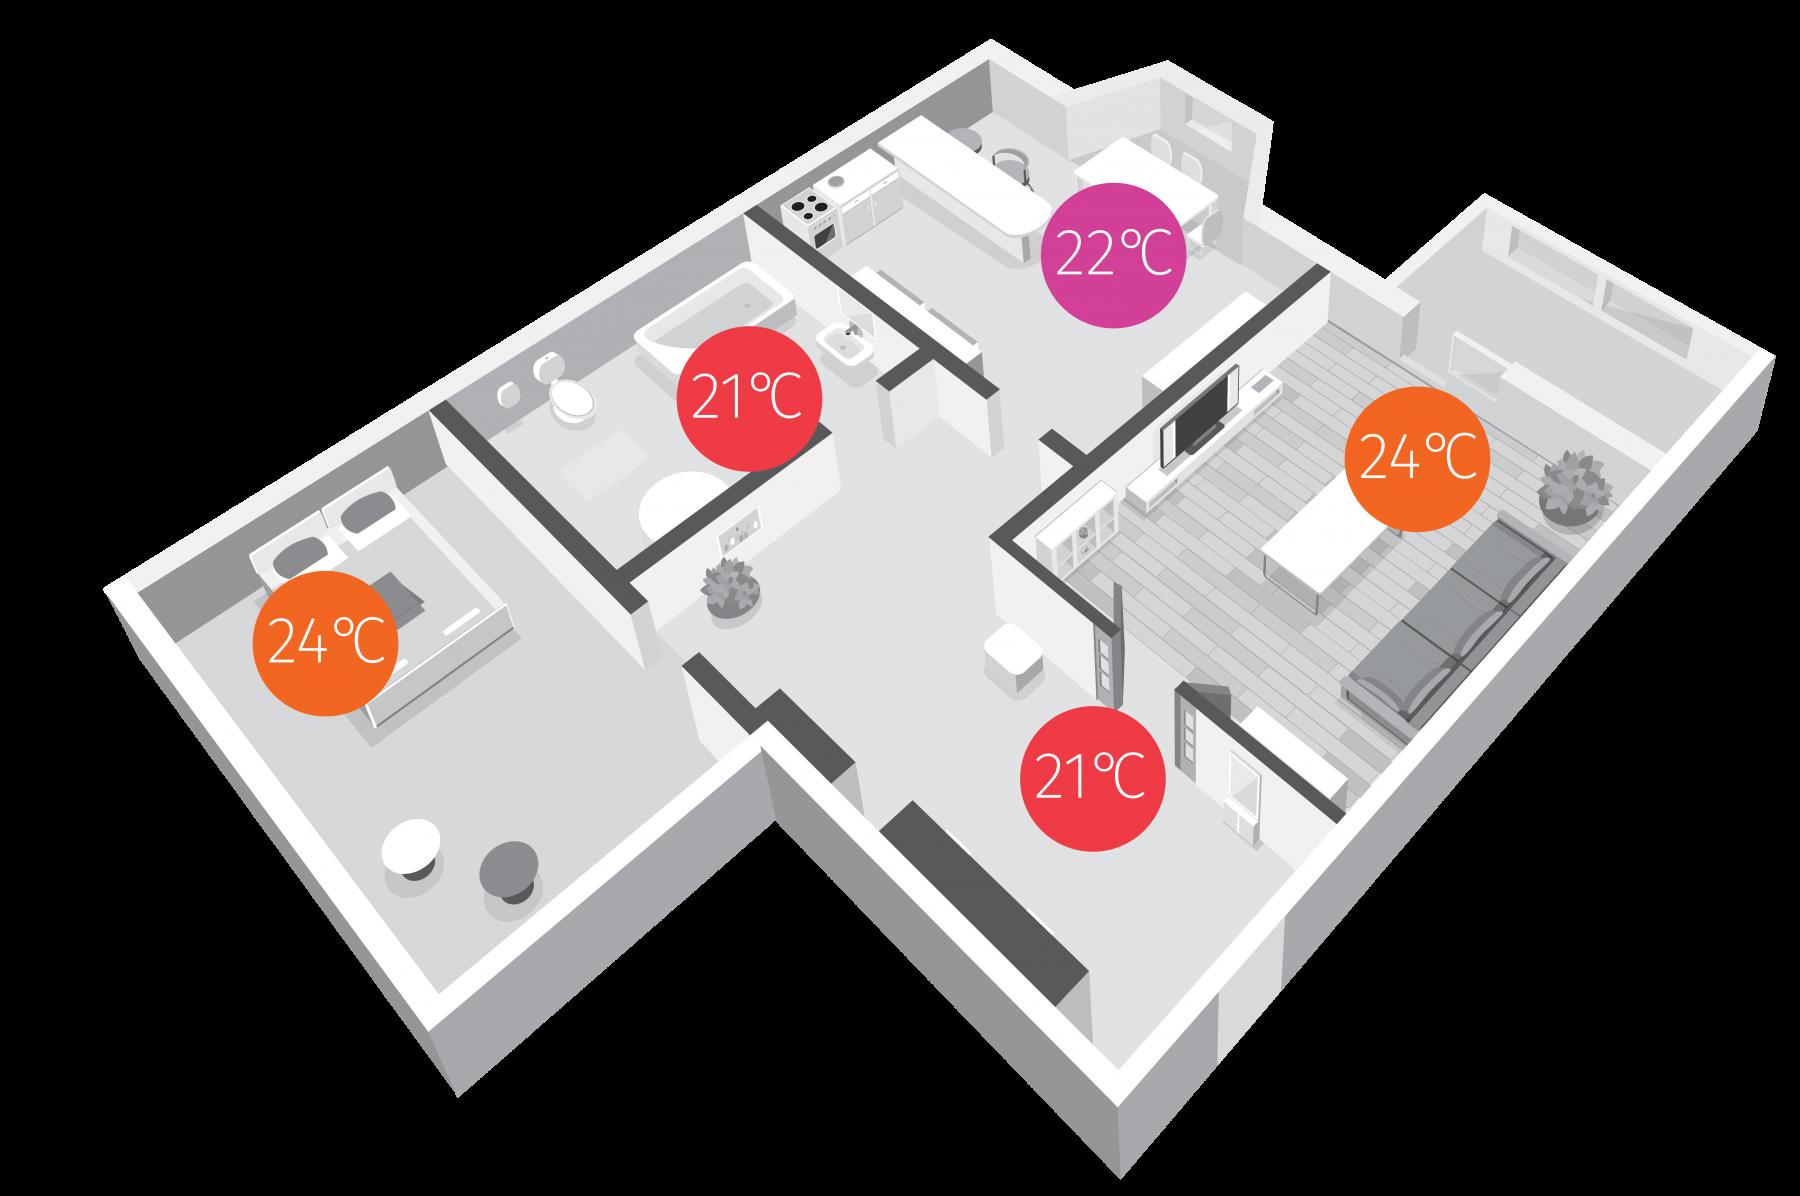 Temperature control in each room